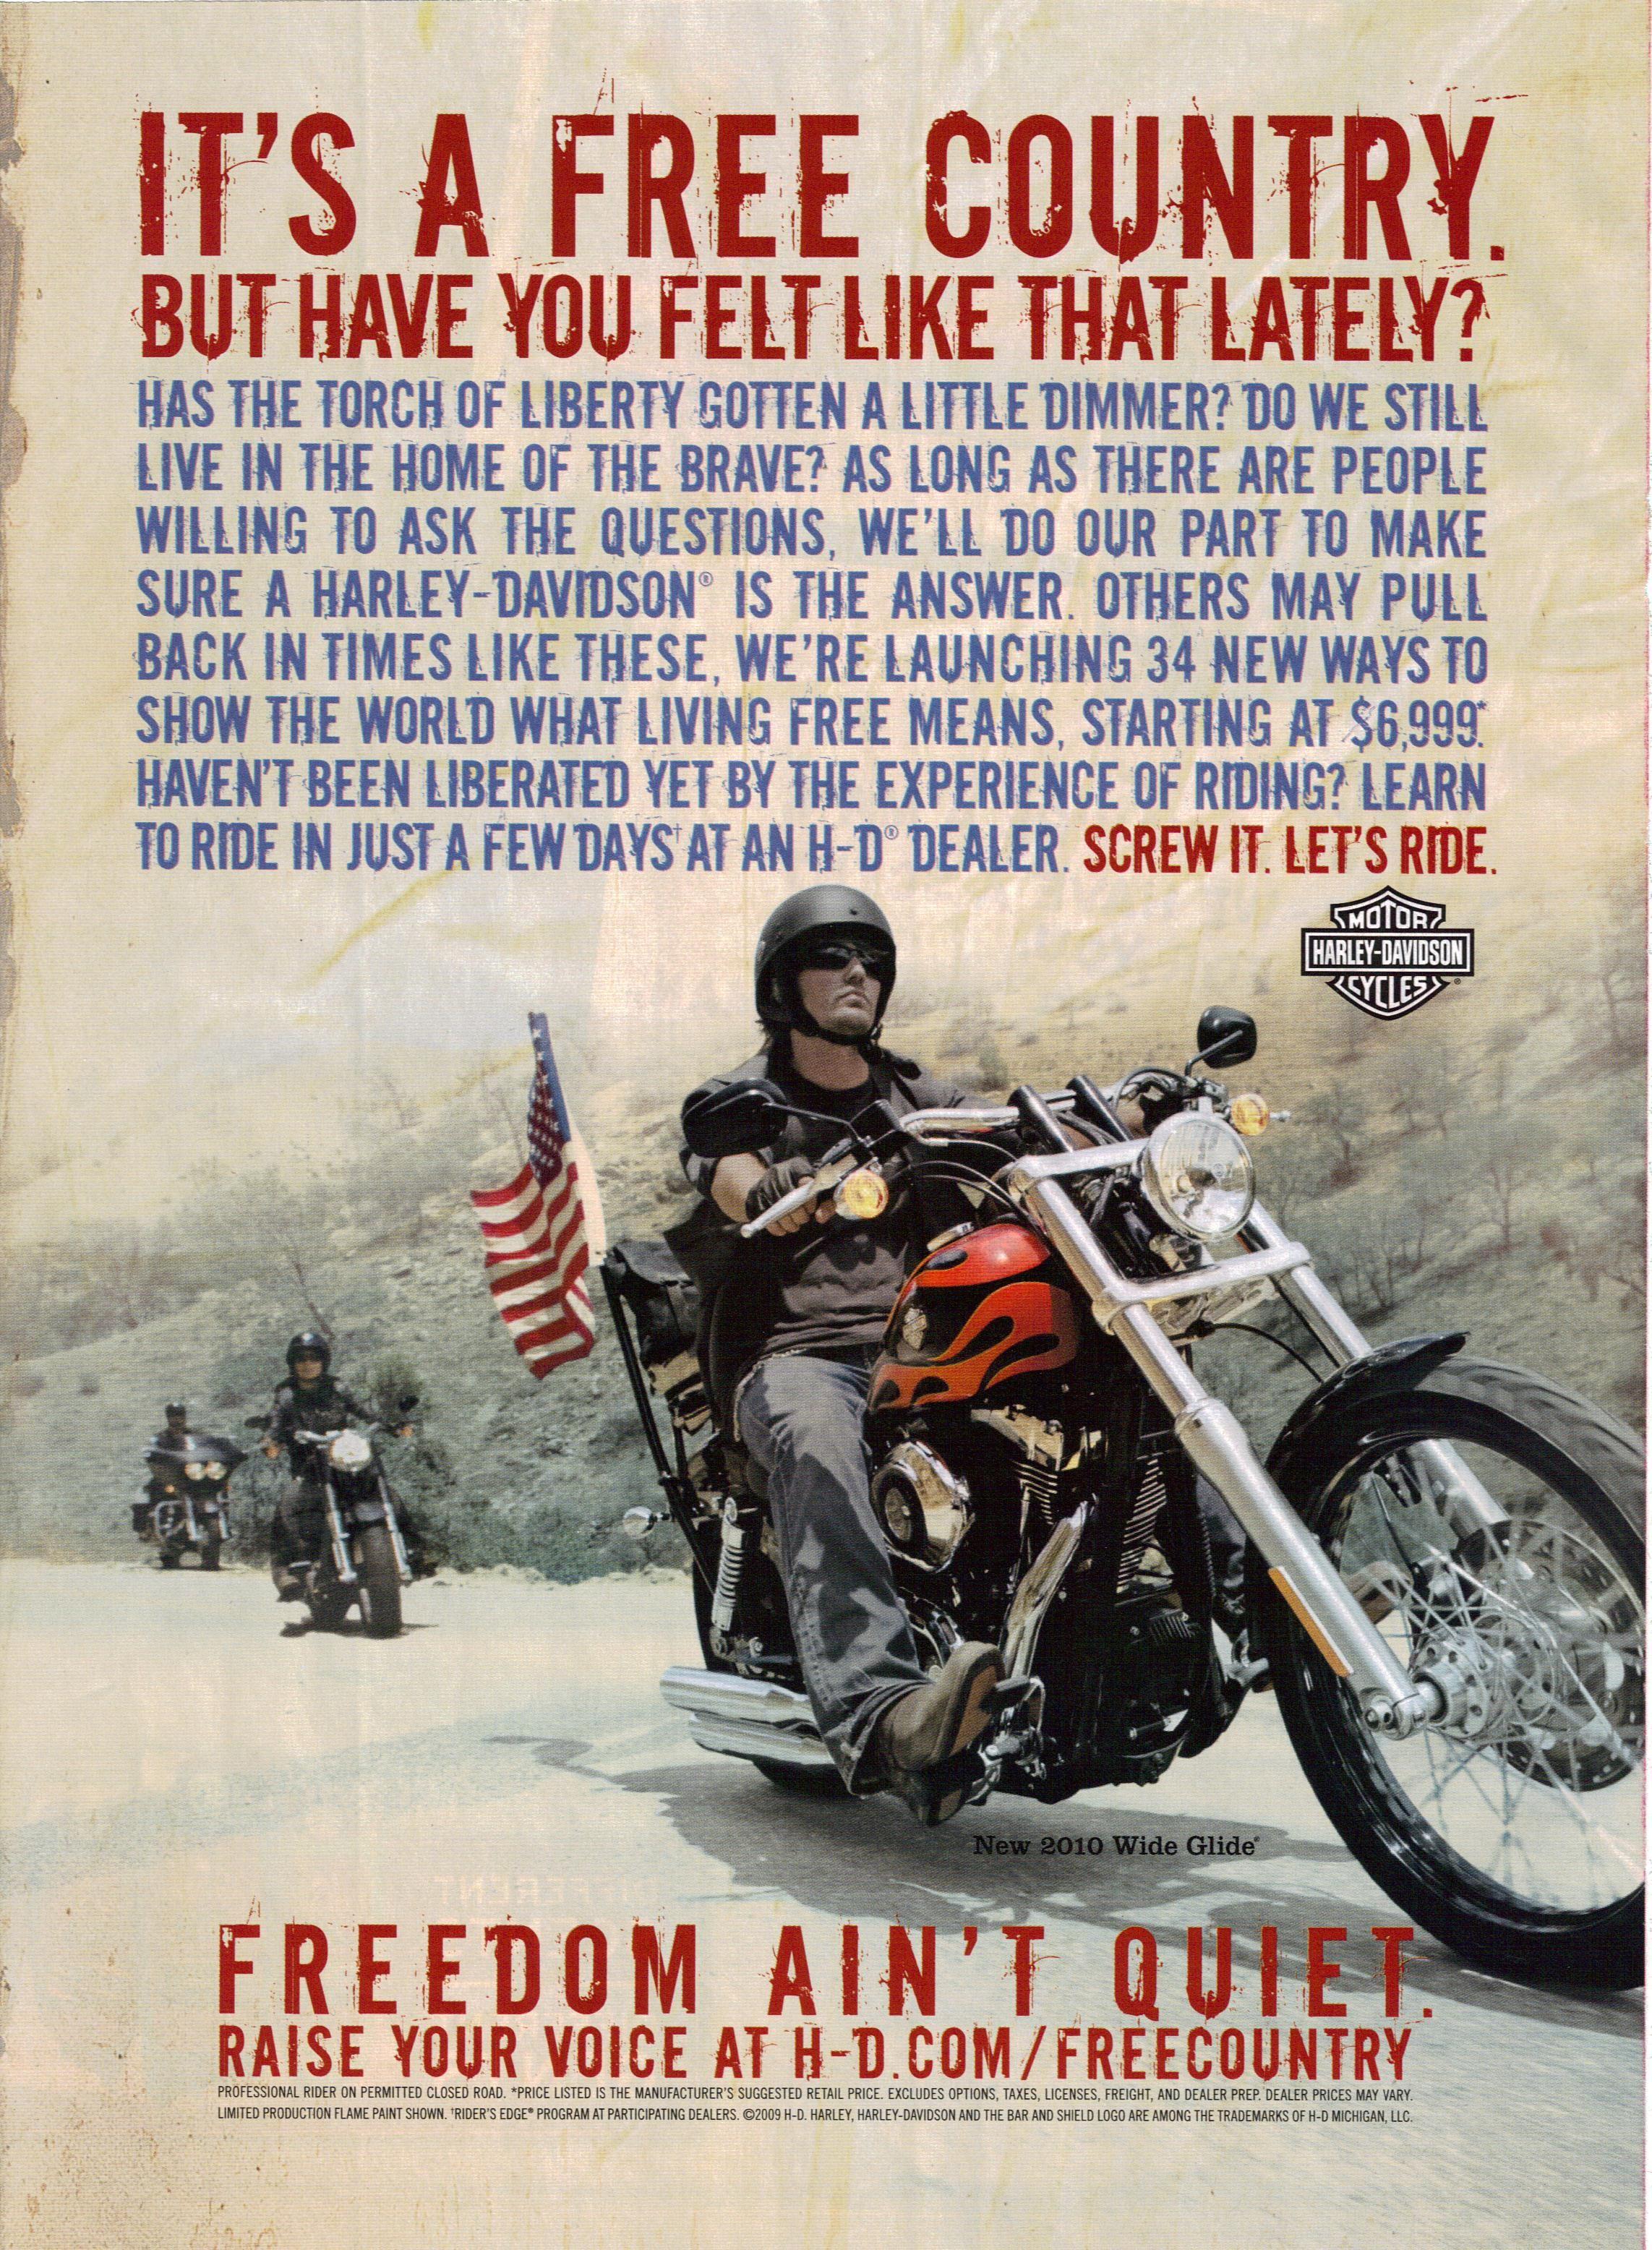 Harley Davidson Advertising: Harley-Davidson Vintage Ad This Is Absolutely Super